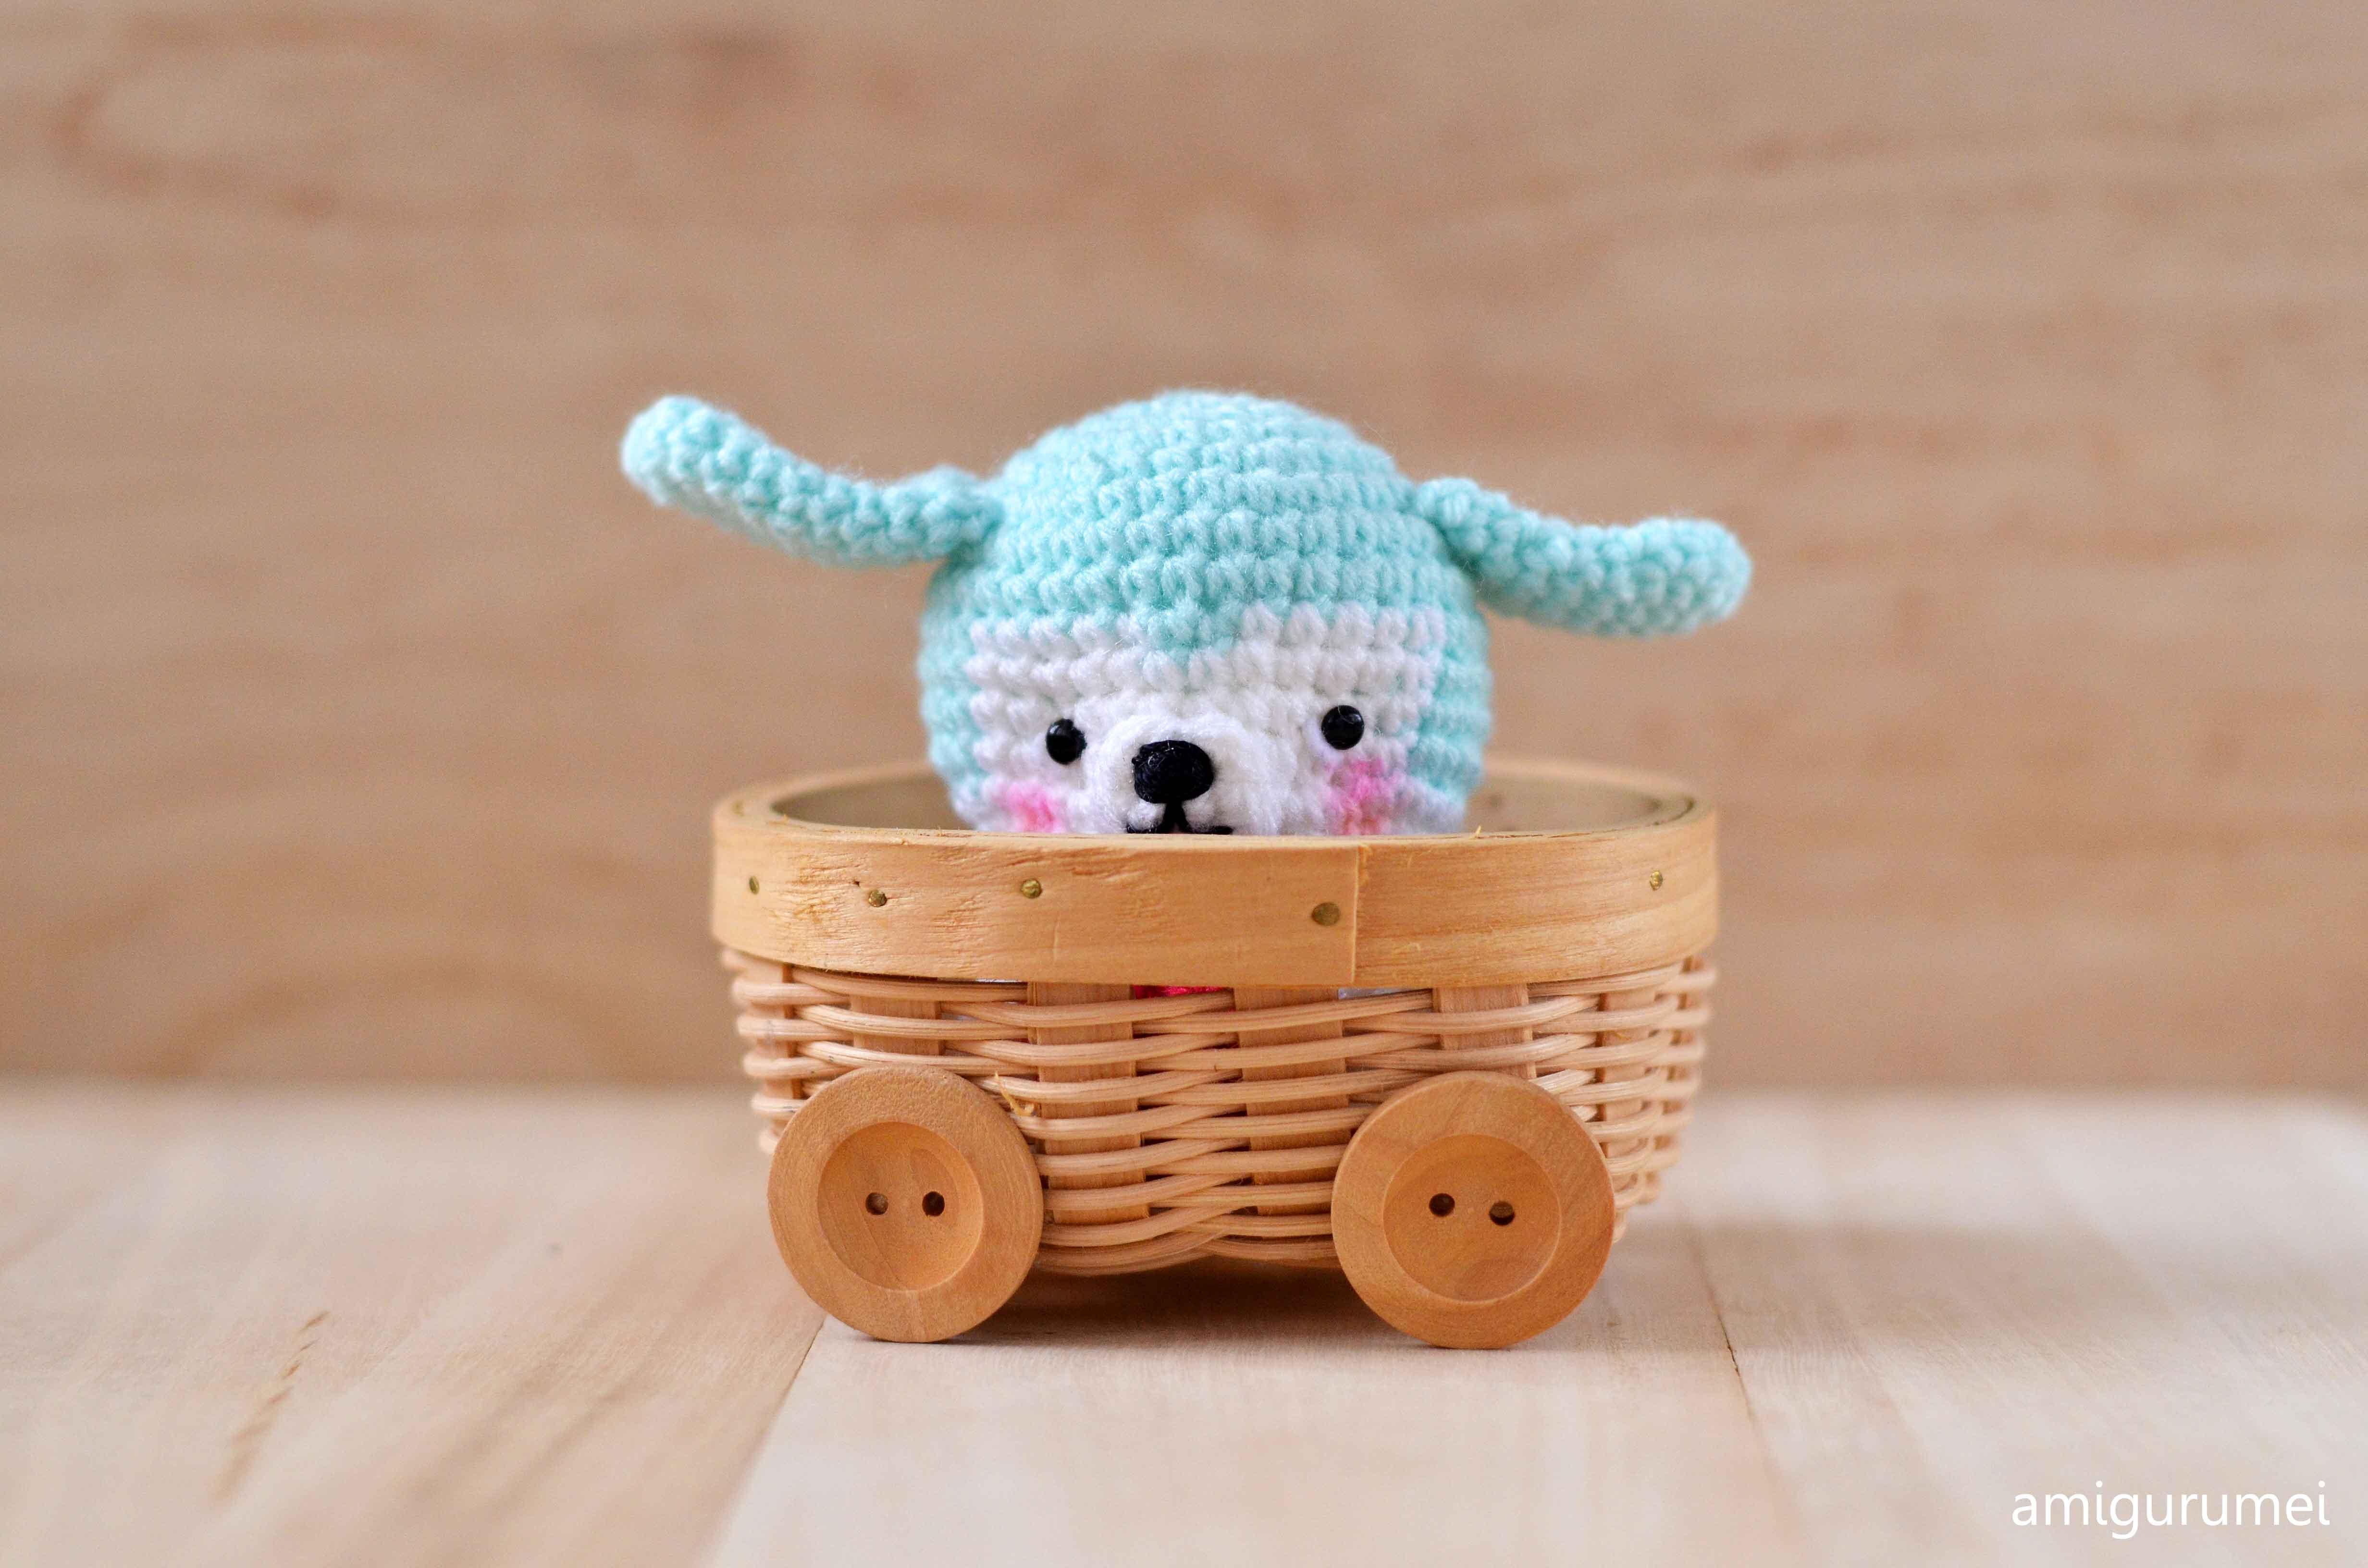 Amigurumi Free Pattern Blog : amigurumei crochet